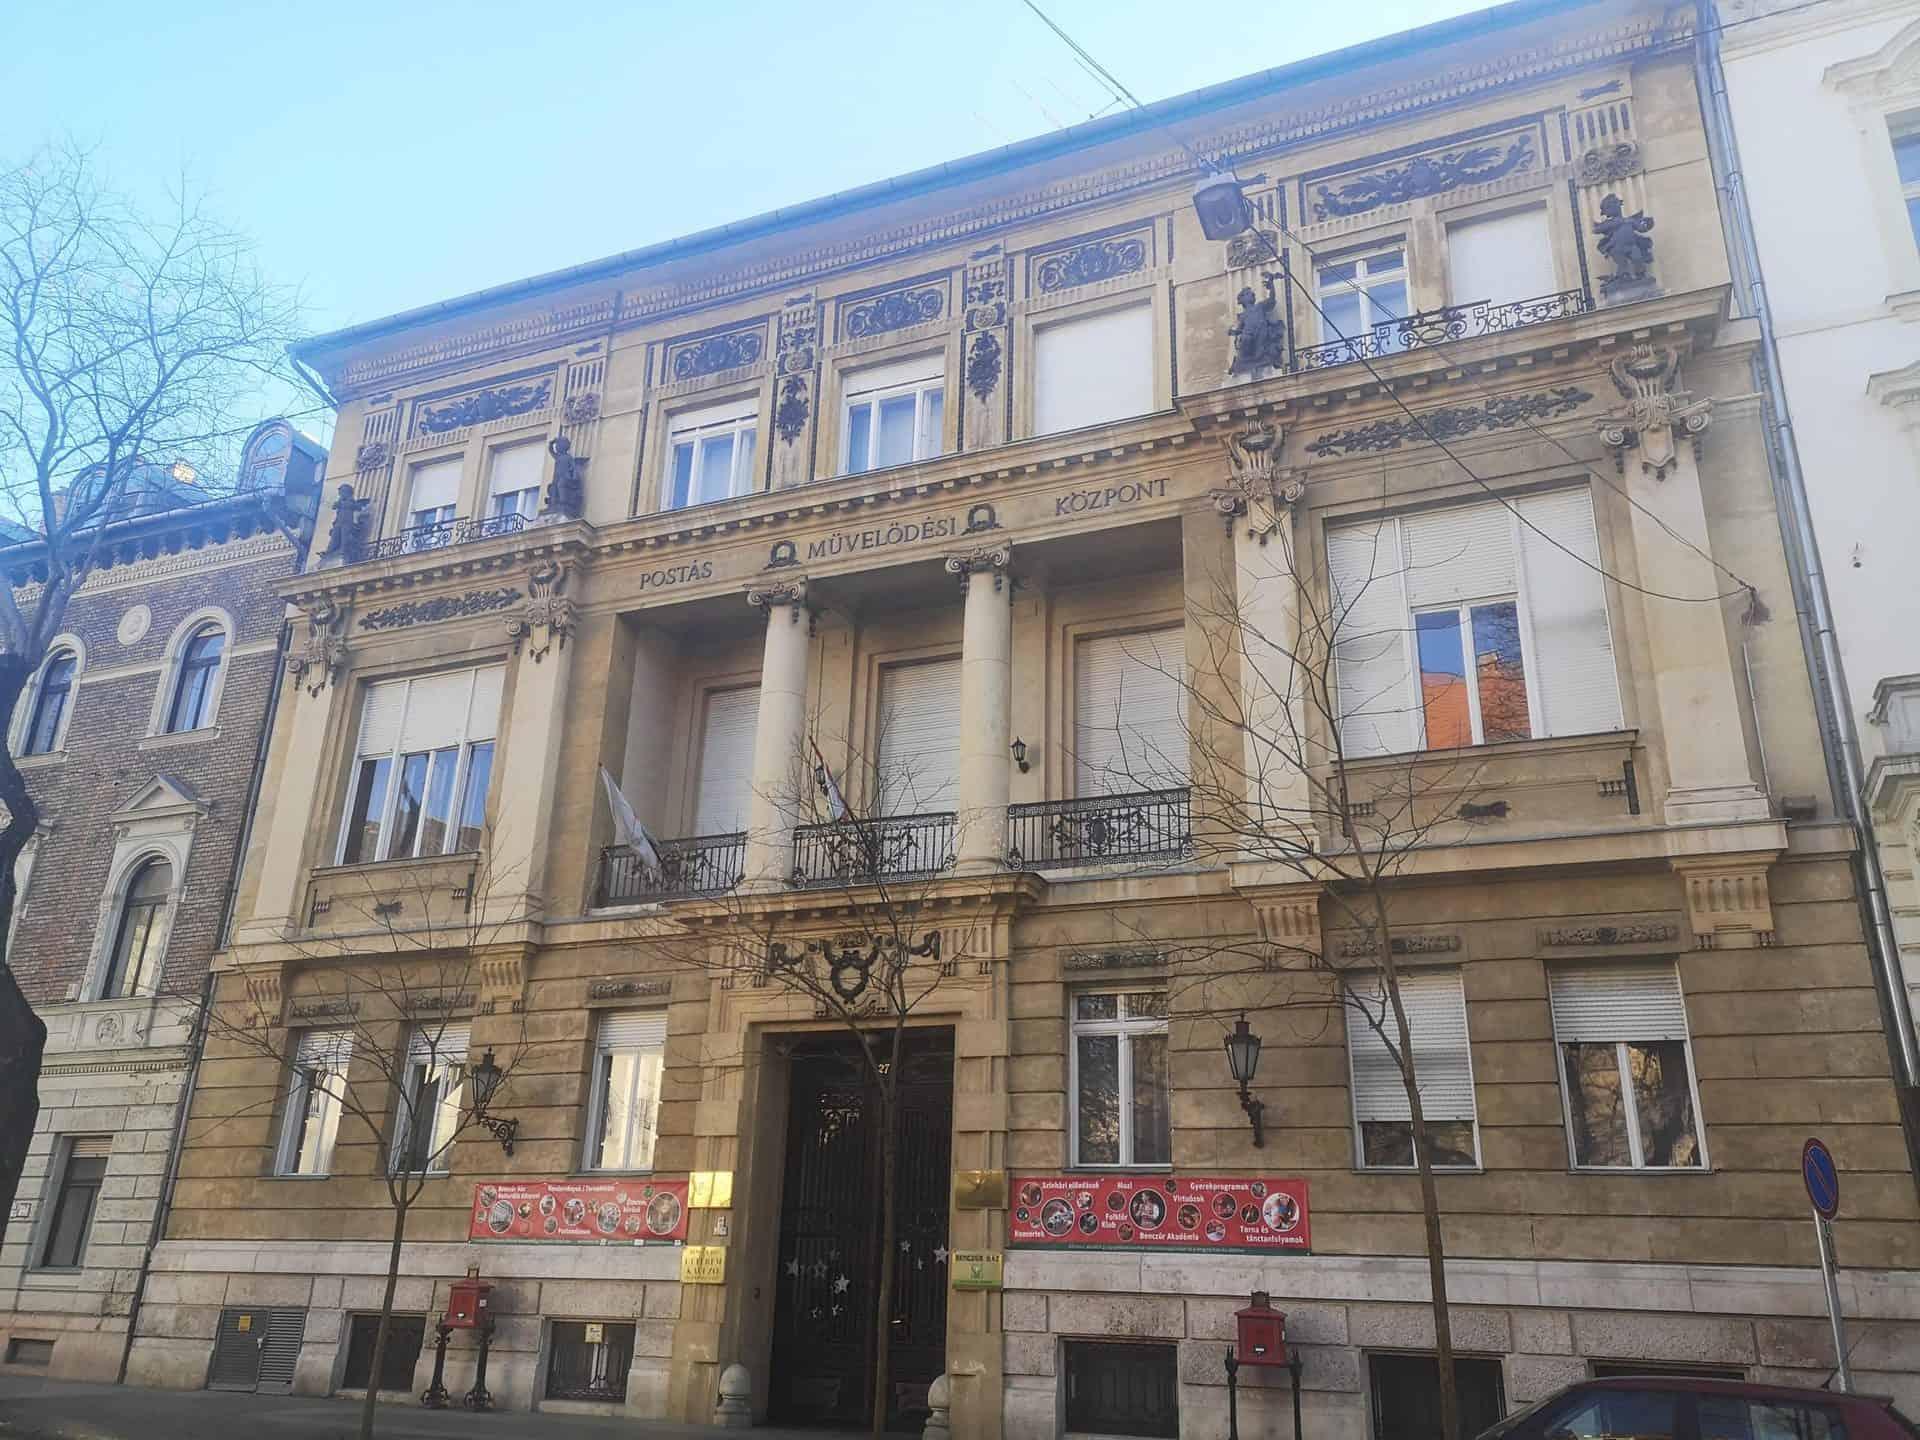 historicalbudapest_Millennial Budapest 4 - The Postal Museum_C